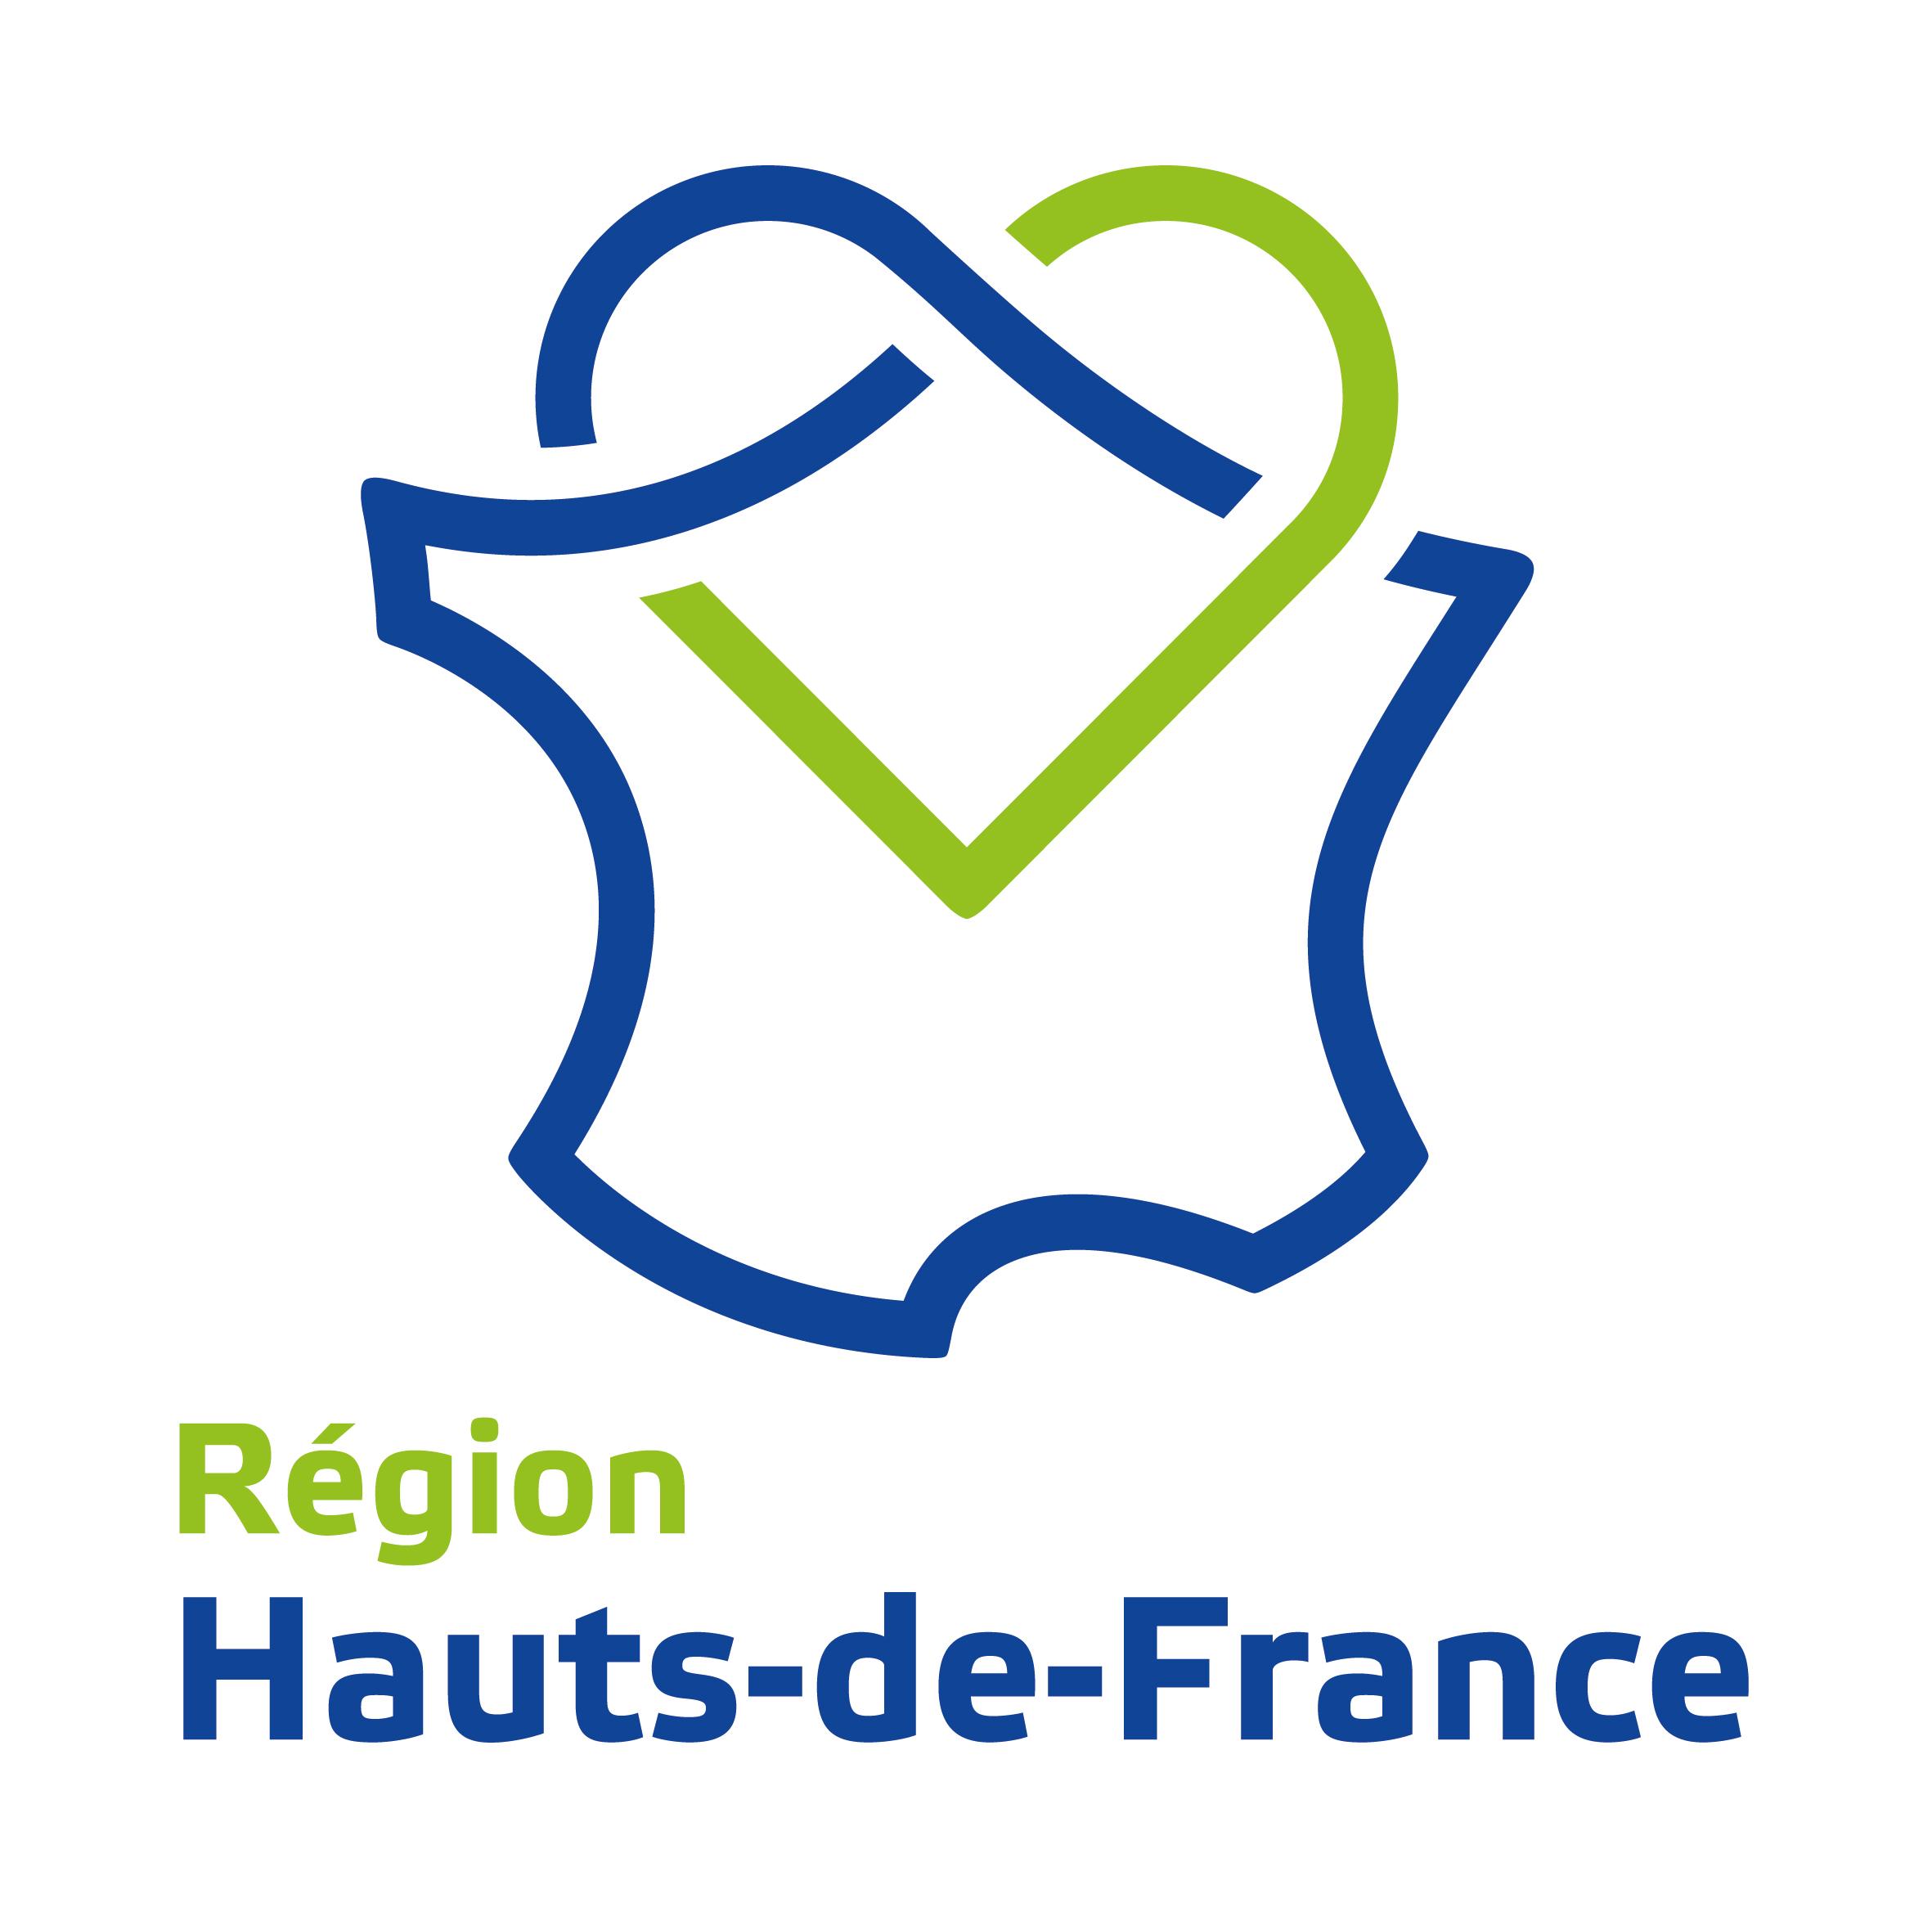 Region Haut de France